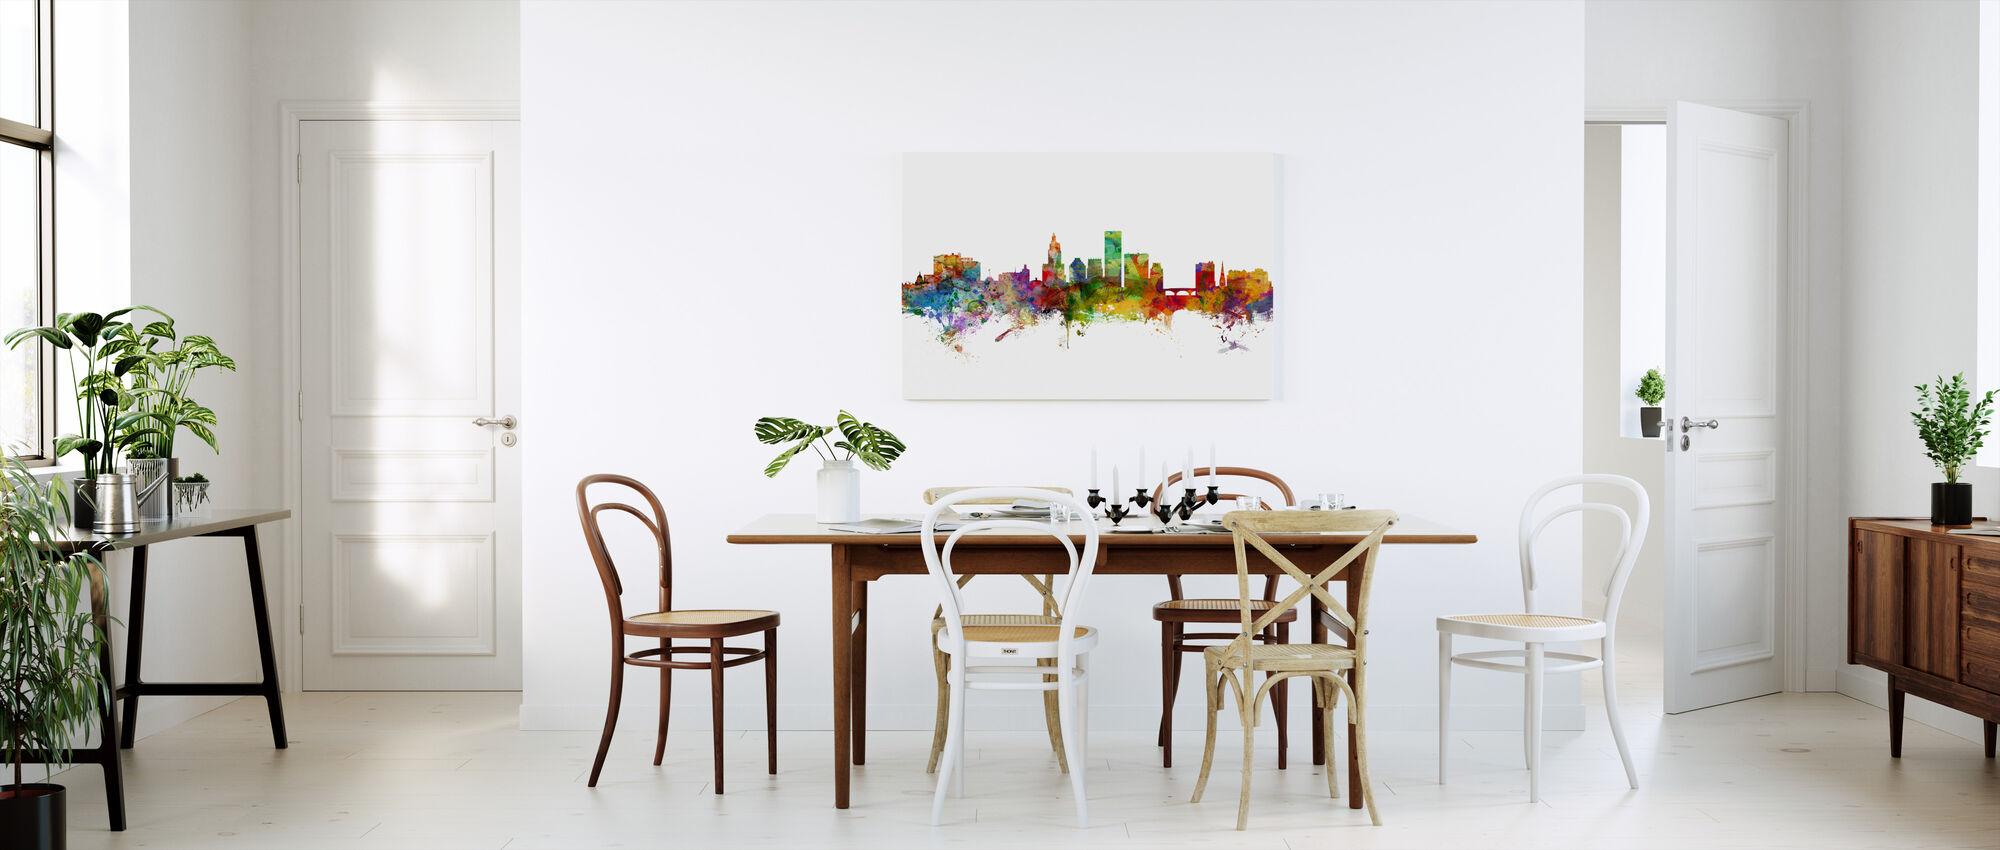 Providence Rhode Island Skyline - Canvas print - Kitchen